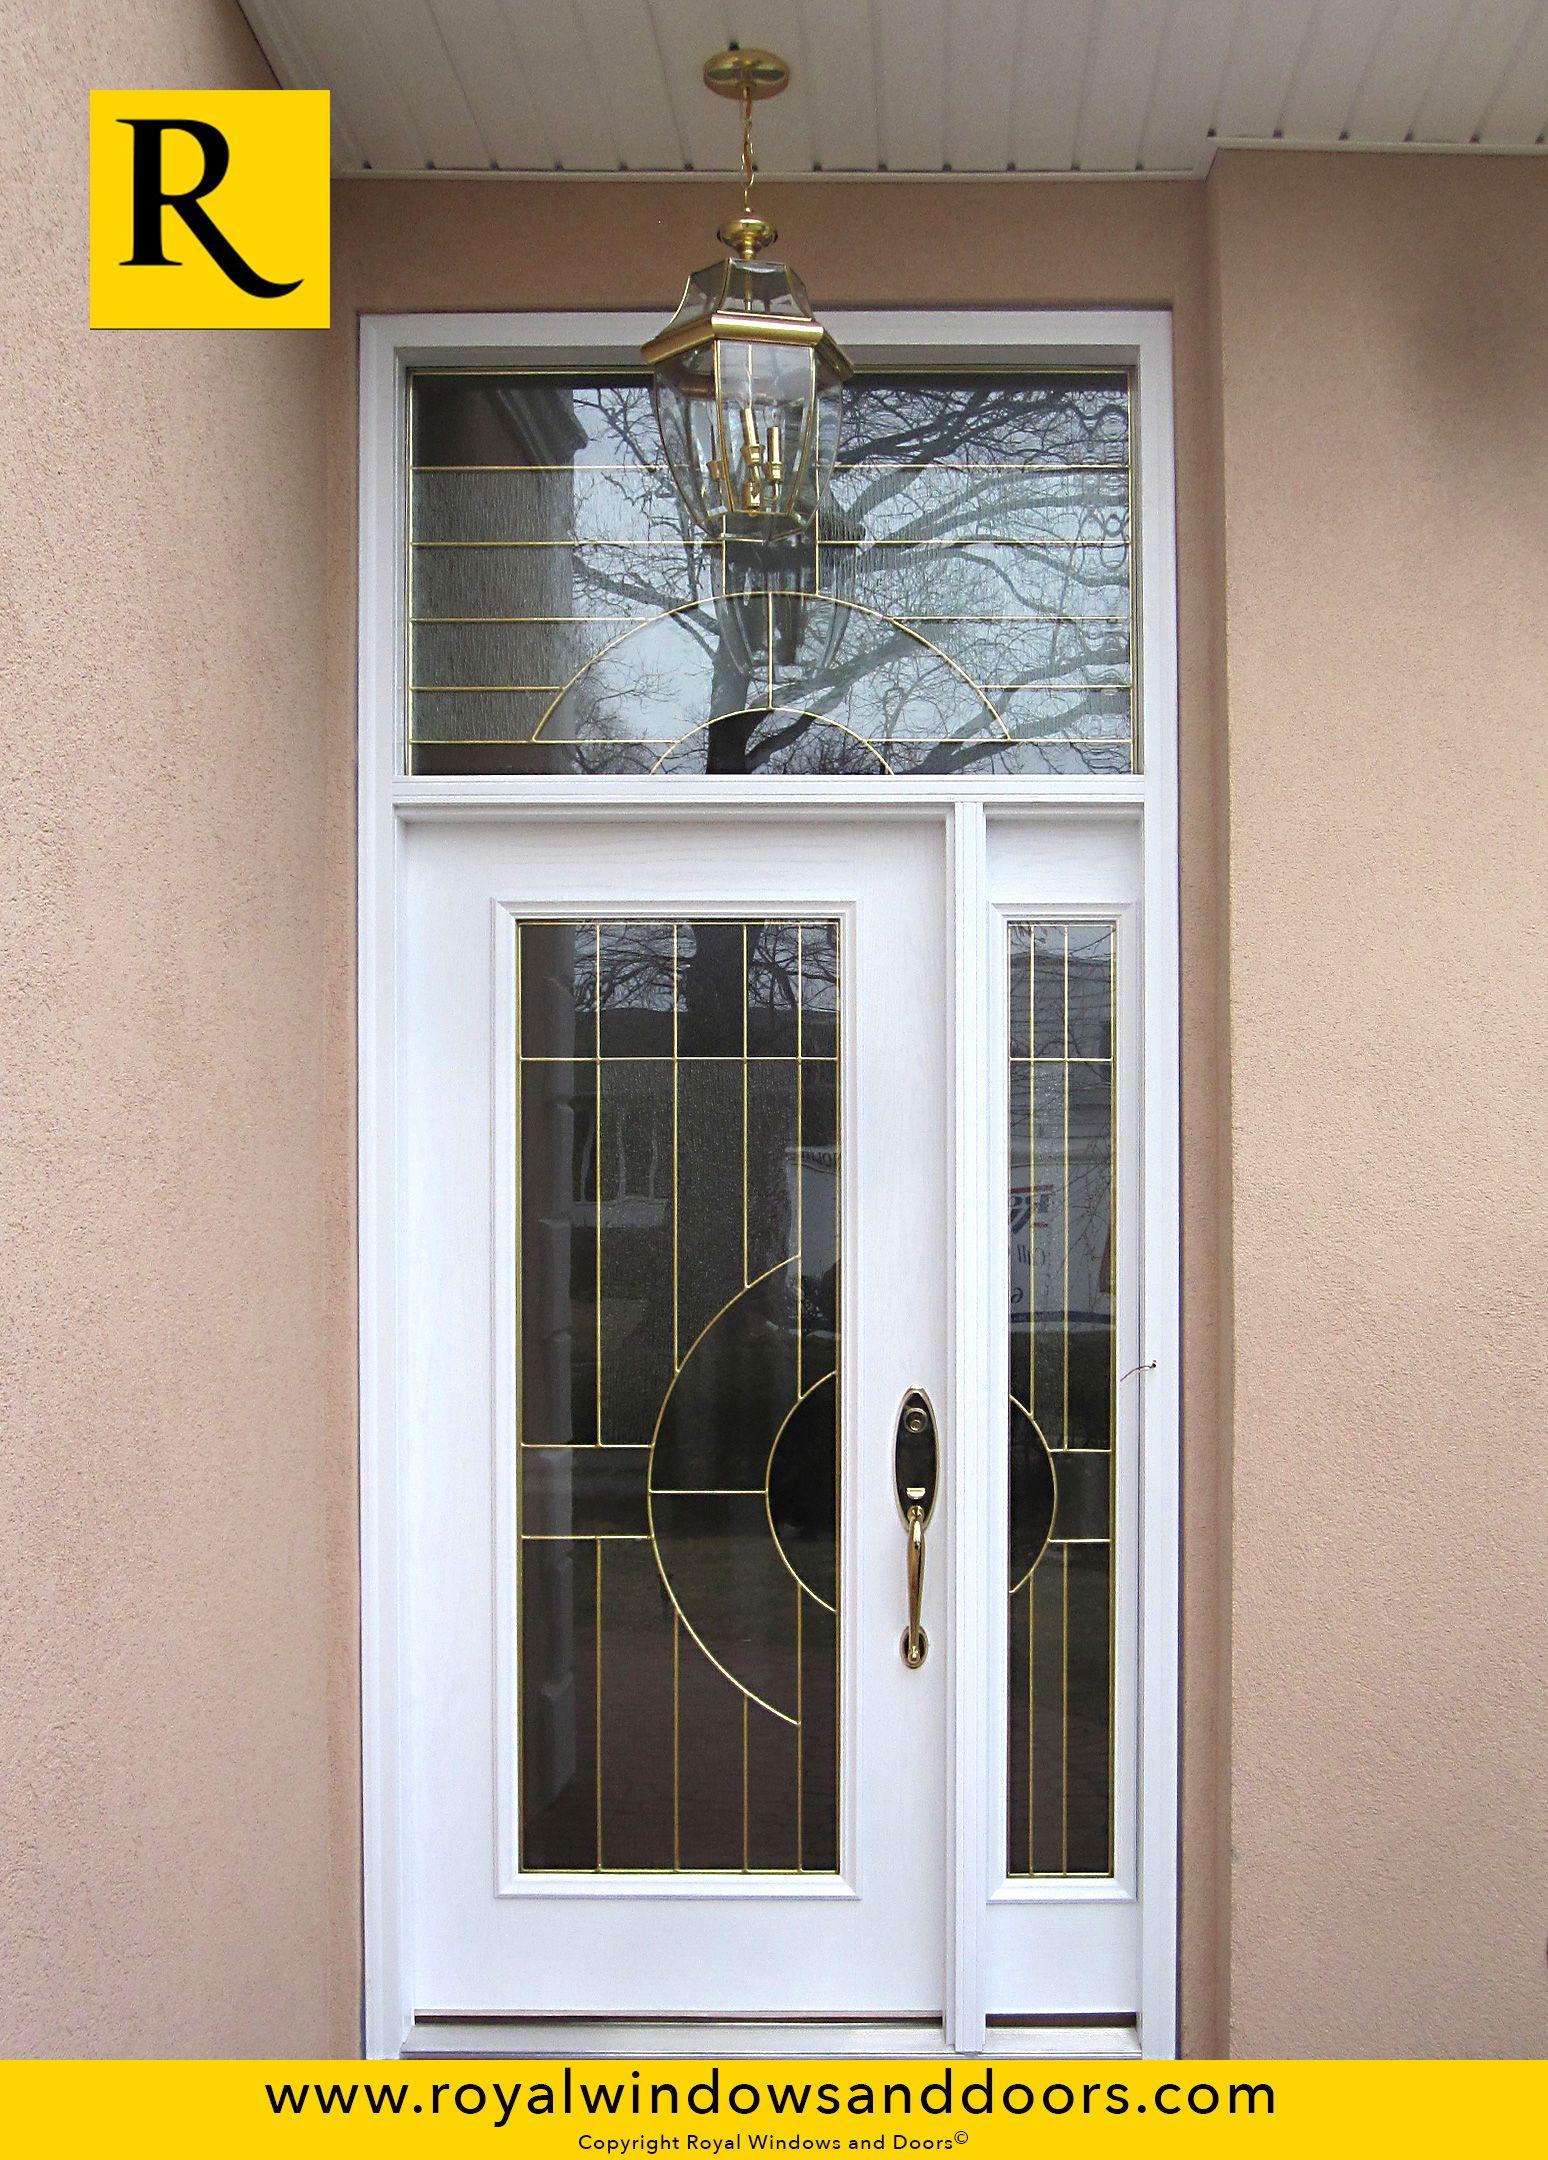 Single entry door in white color designer glass one for Single entry door with glass